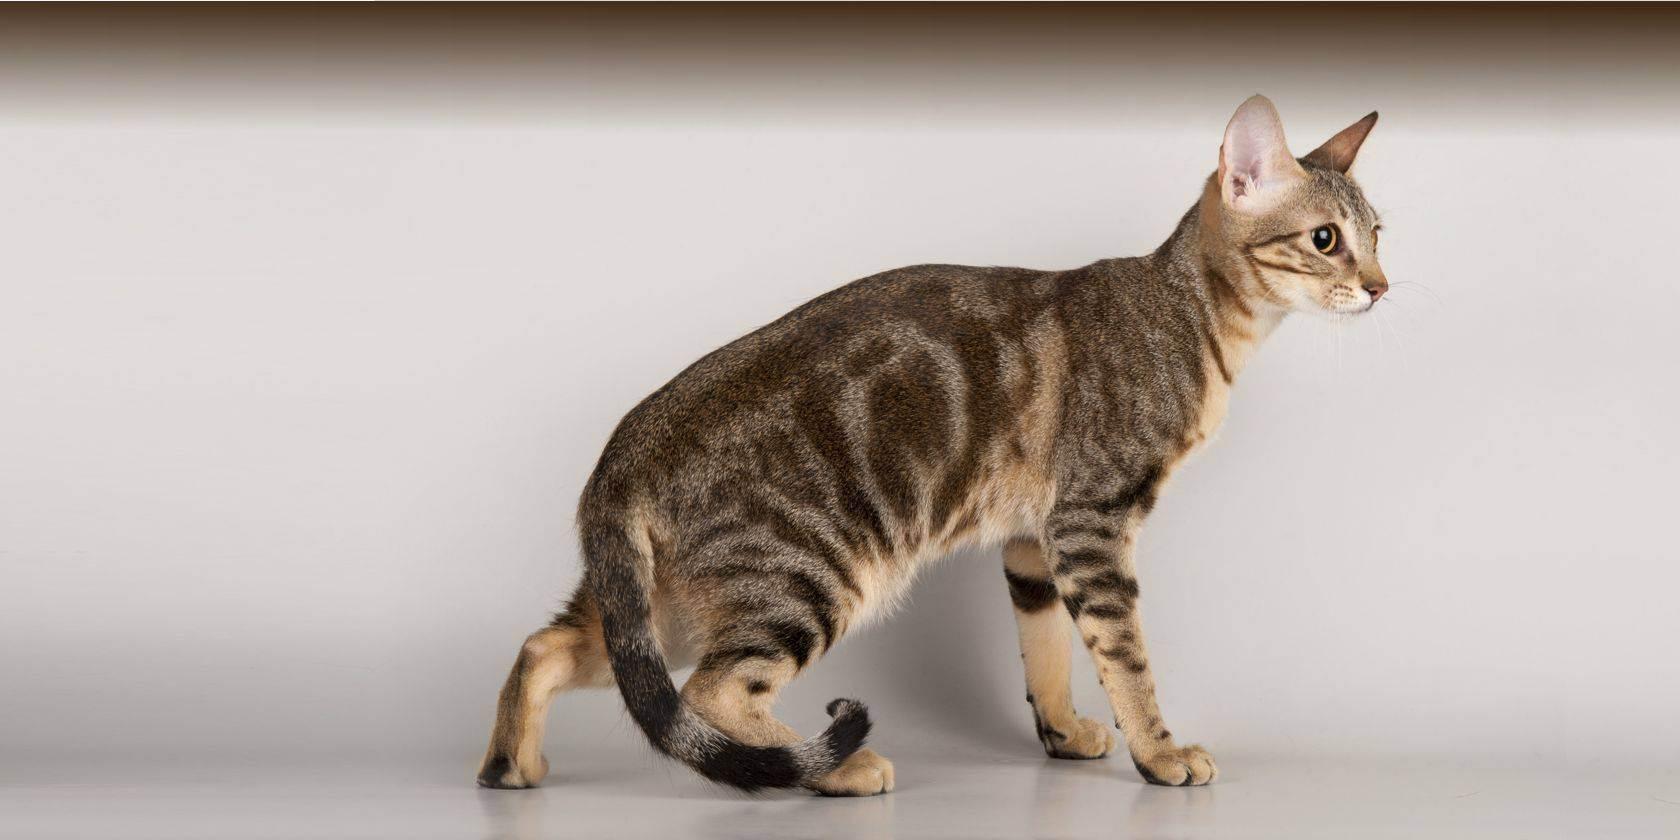 Оцикет кошка: фото и описание породы, характер кота, содержание и уход